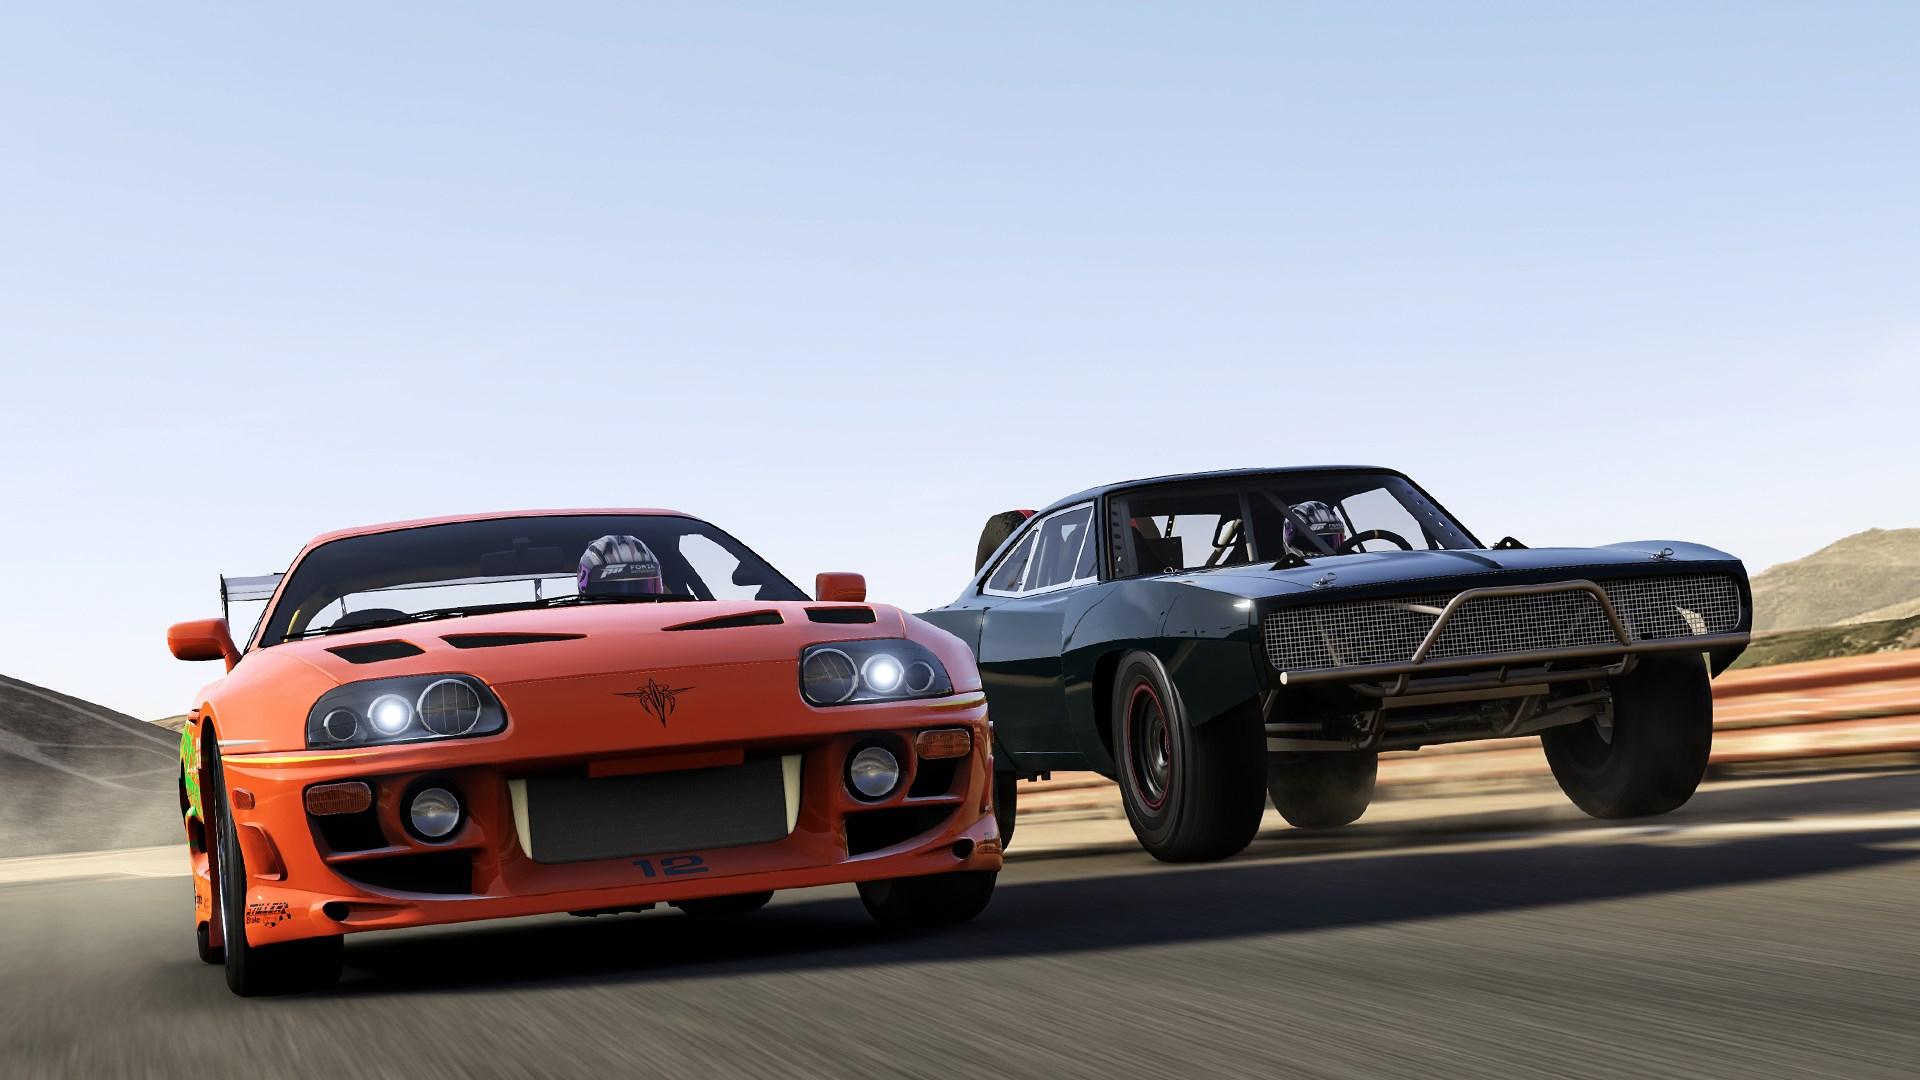 1999 Nissan Skyline GT-R (R34) Fast & Furious Edition